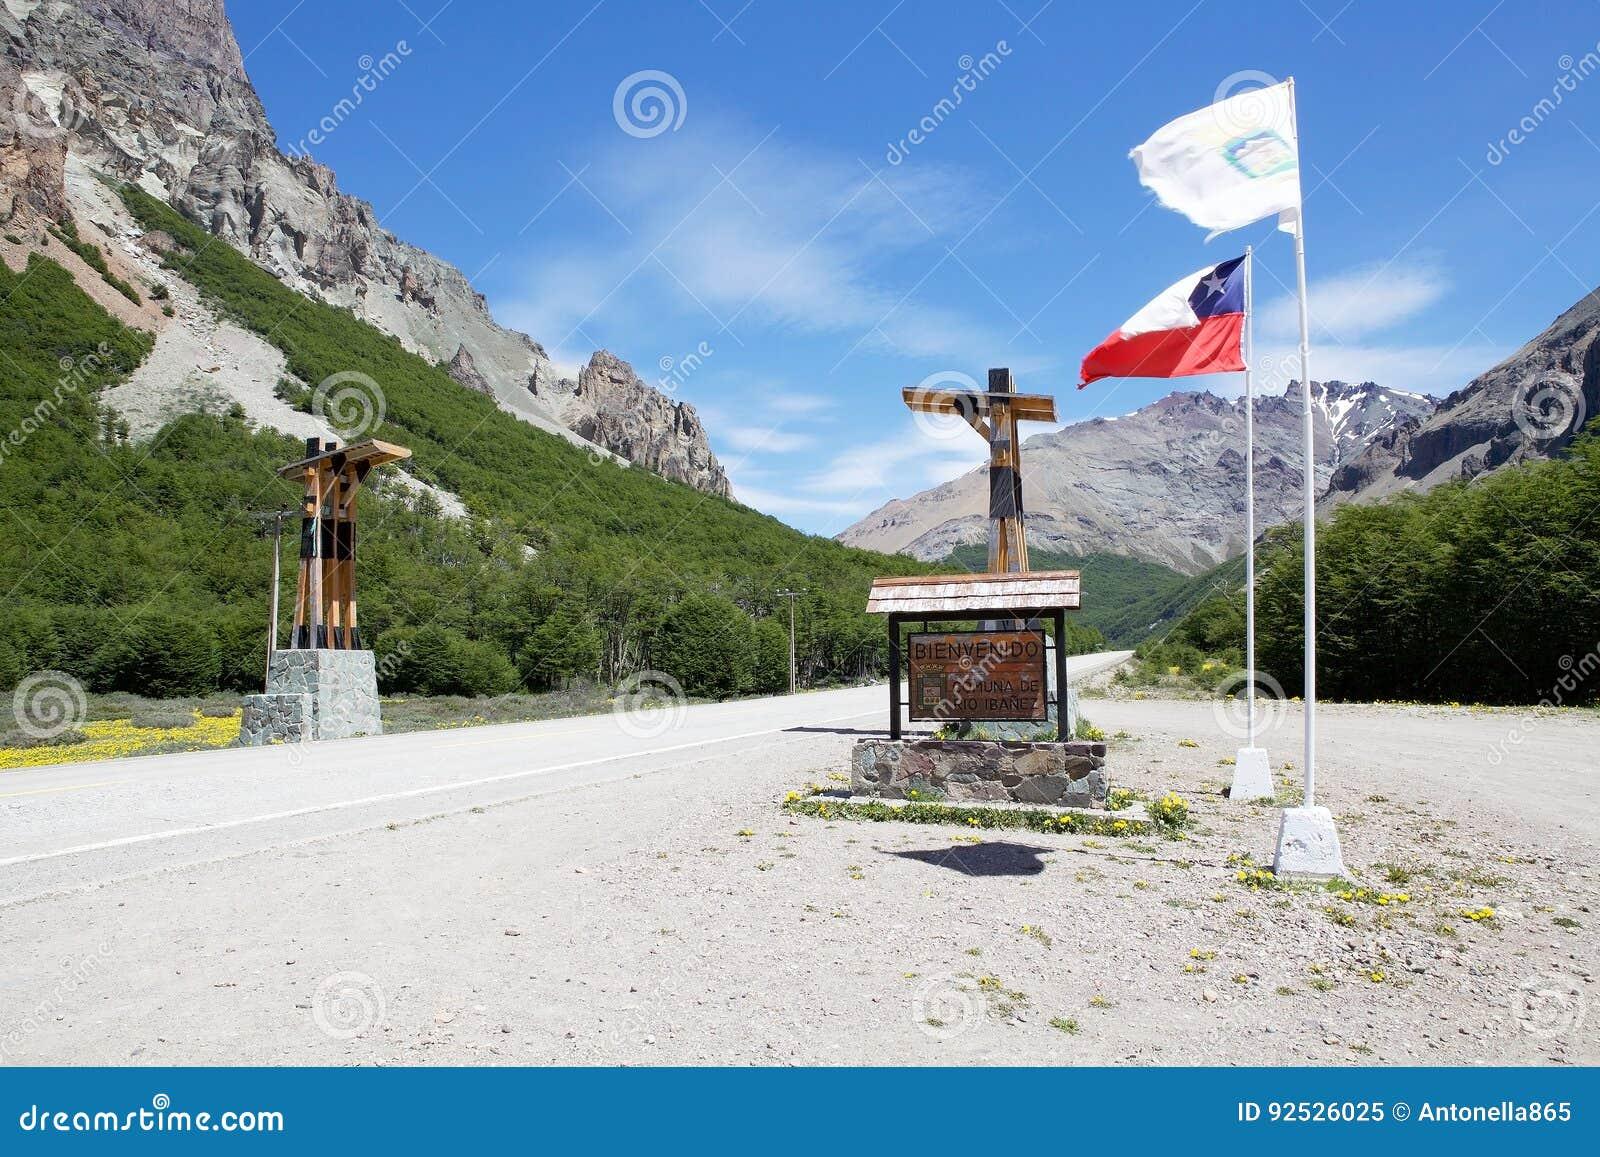 Den Austral Carreteraen, Chile